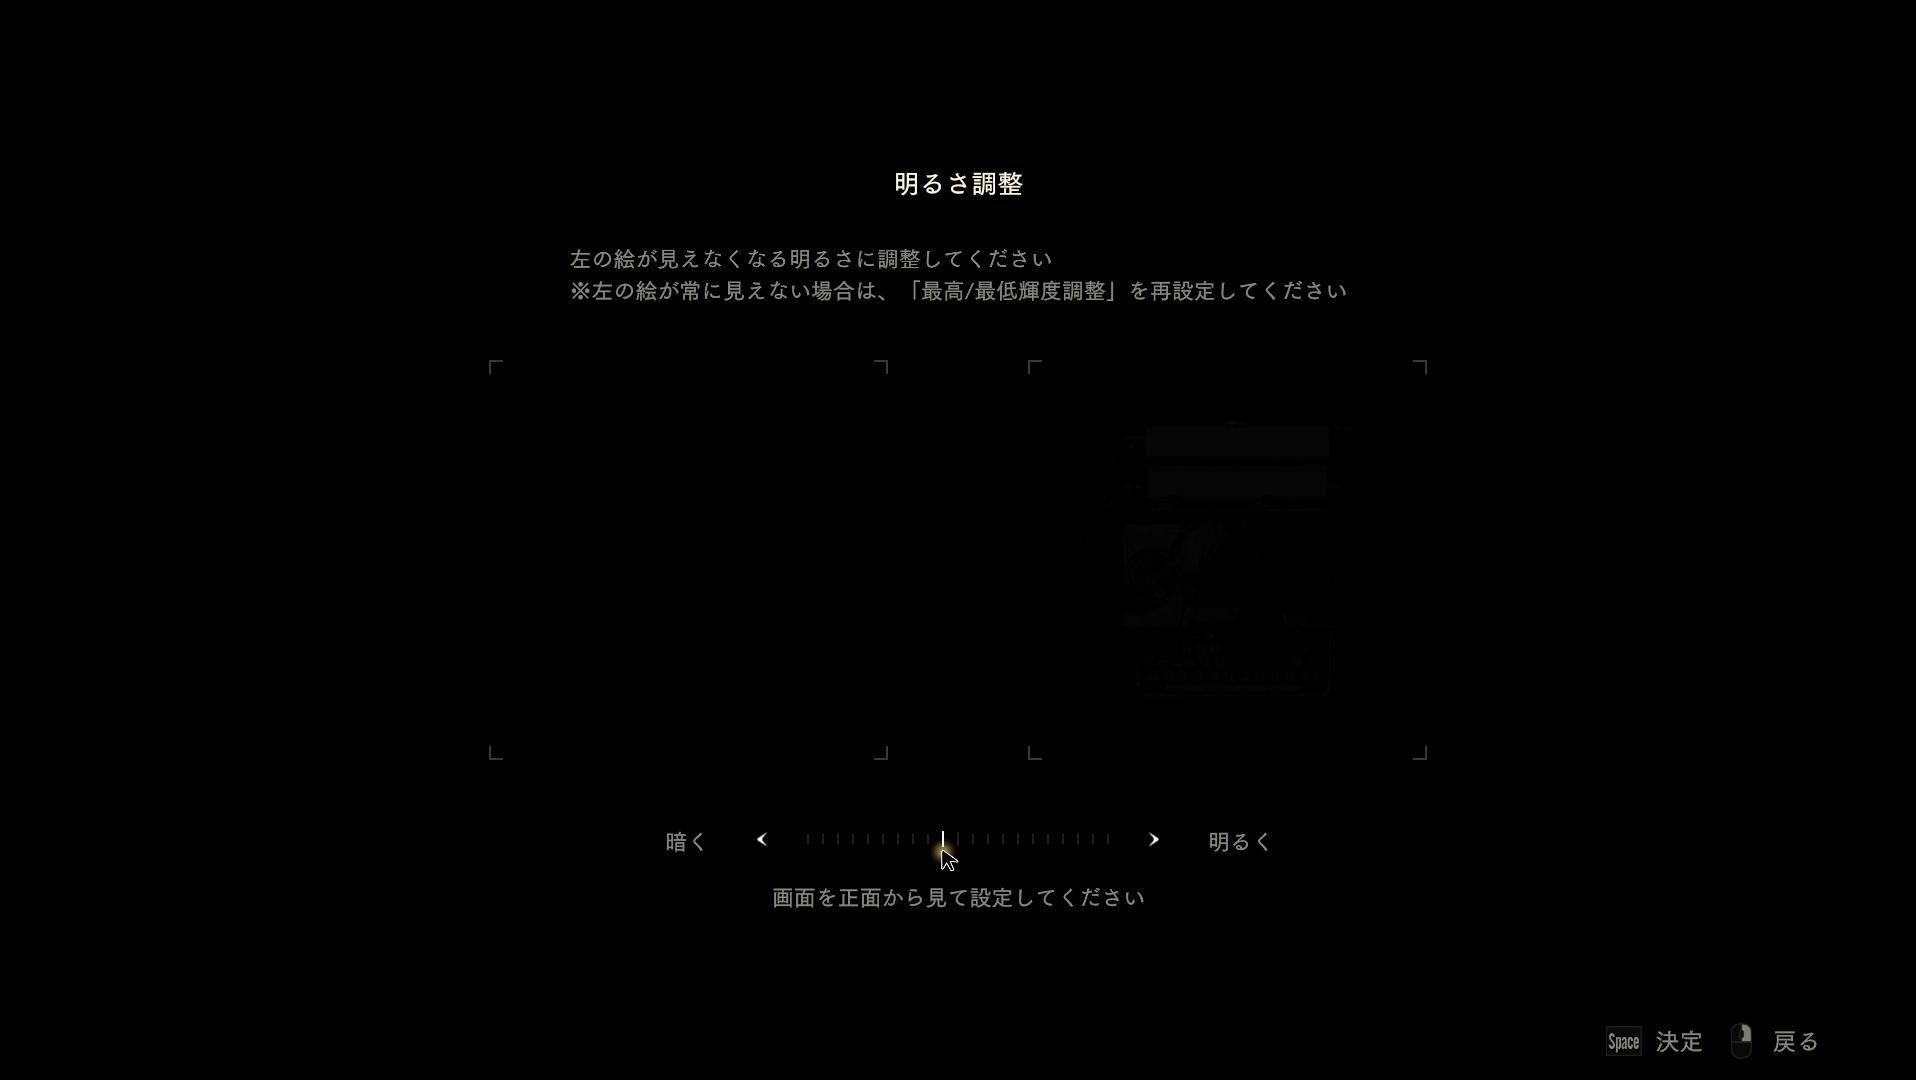 Steam 版 バイオハザード RE:2 色空間・明るさ設定の違い、色空間 Rec.709 用、明るさ調整 一番暗い設定から目盛りを 9段階上げる(目盛り中央から 1段階目盛り下げる)